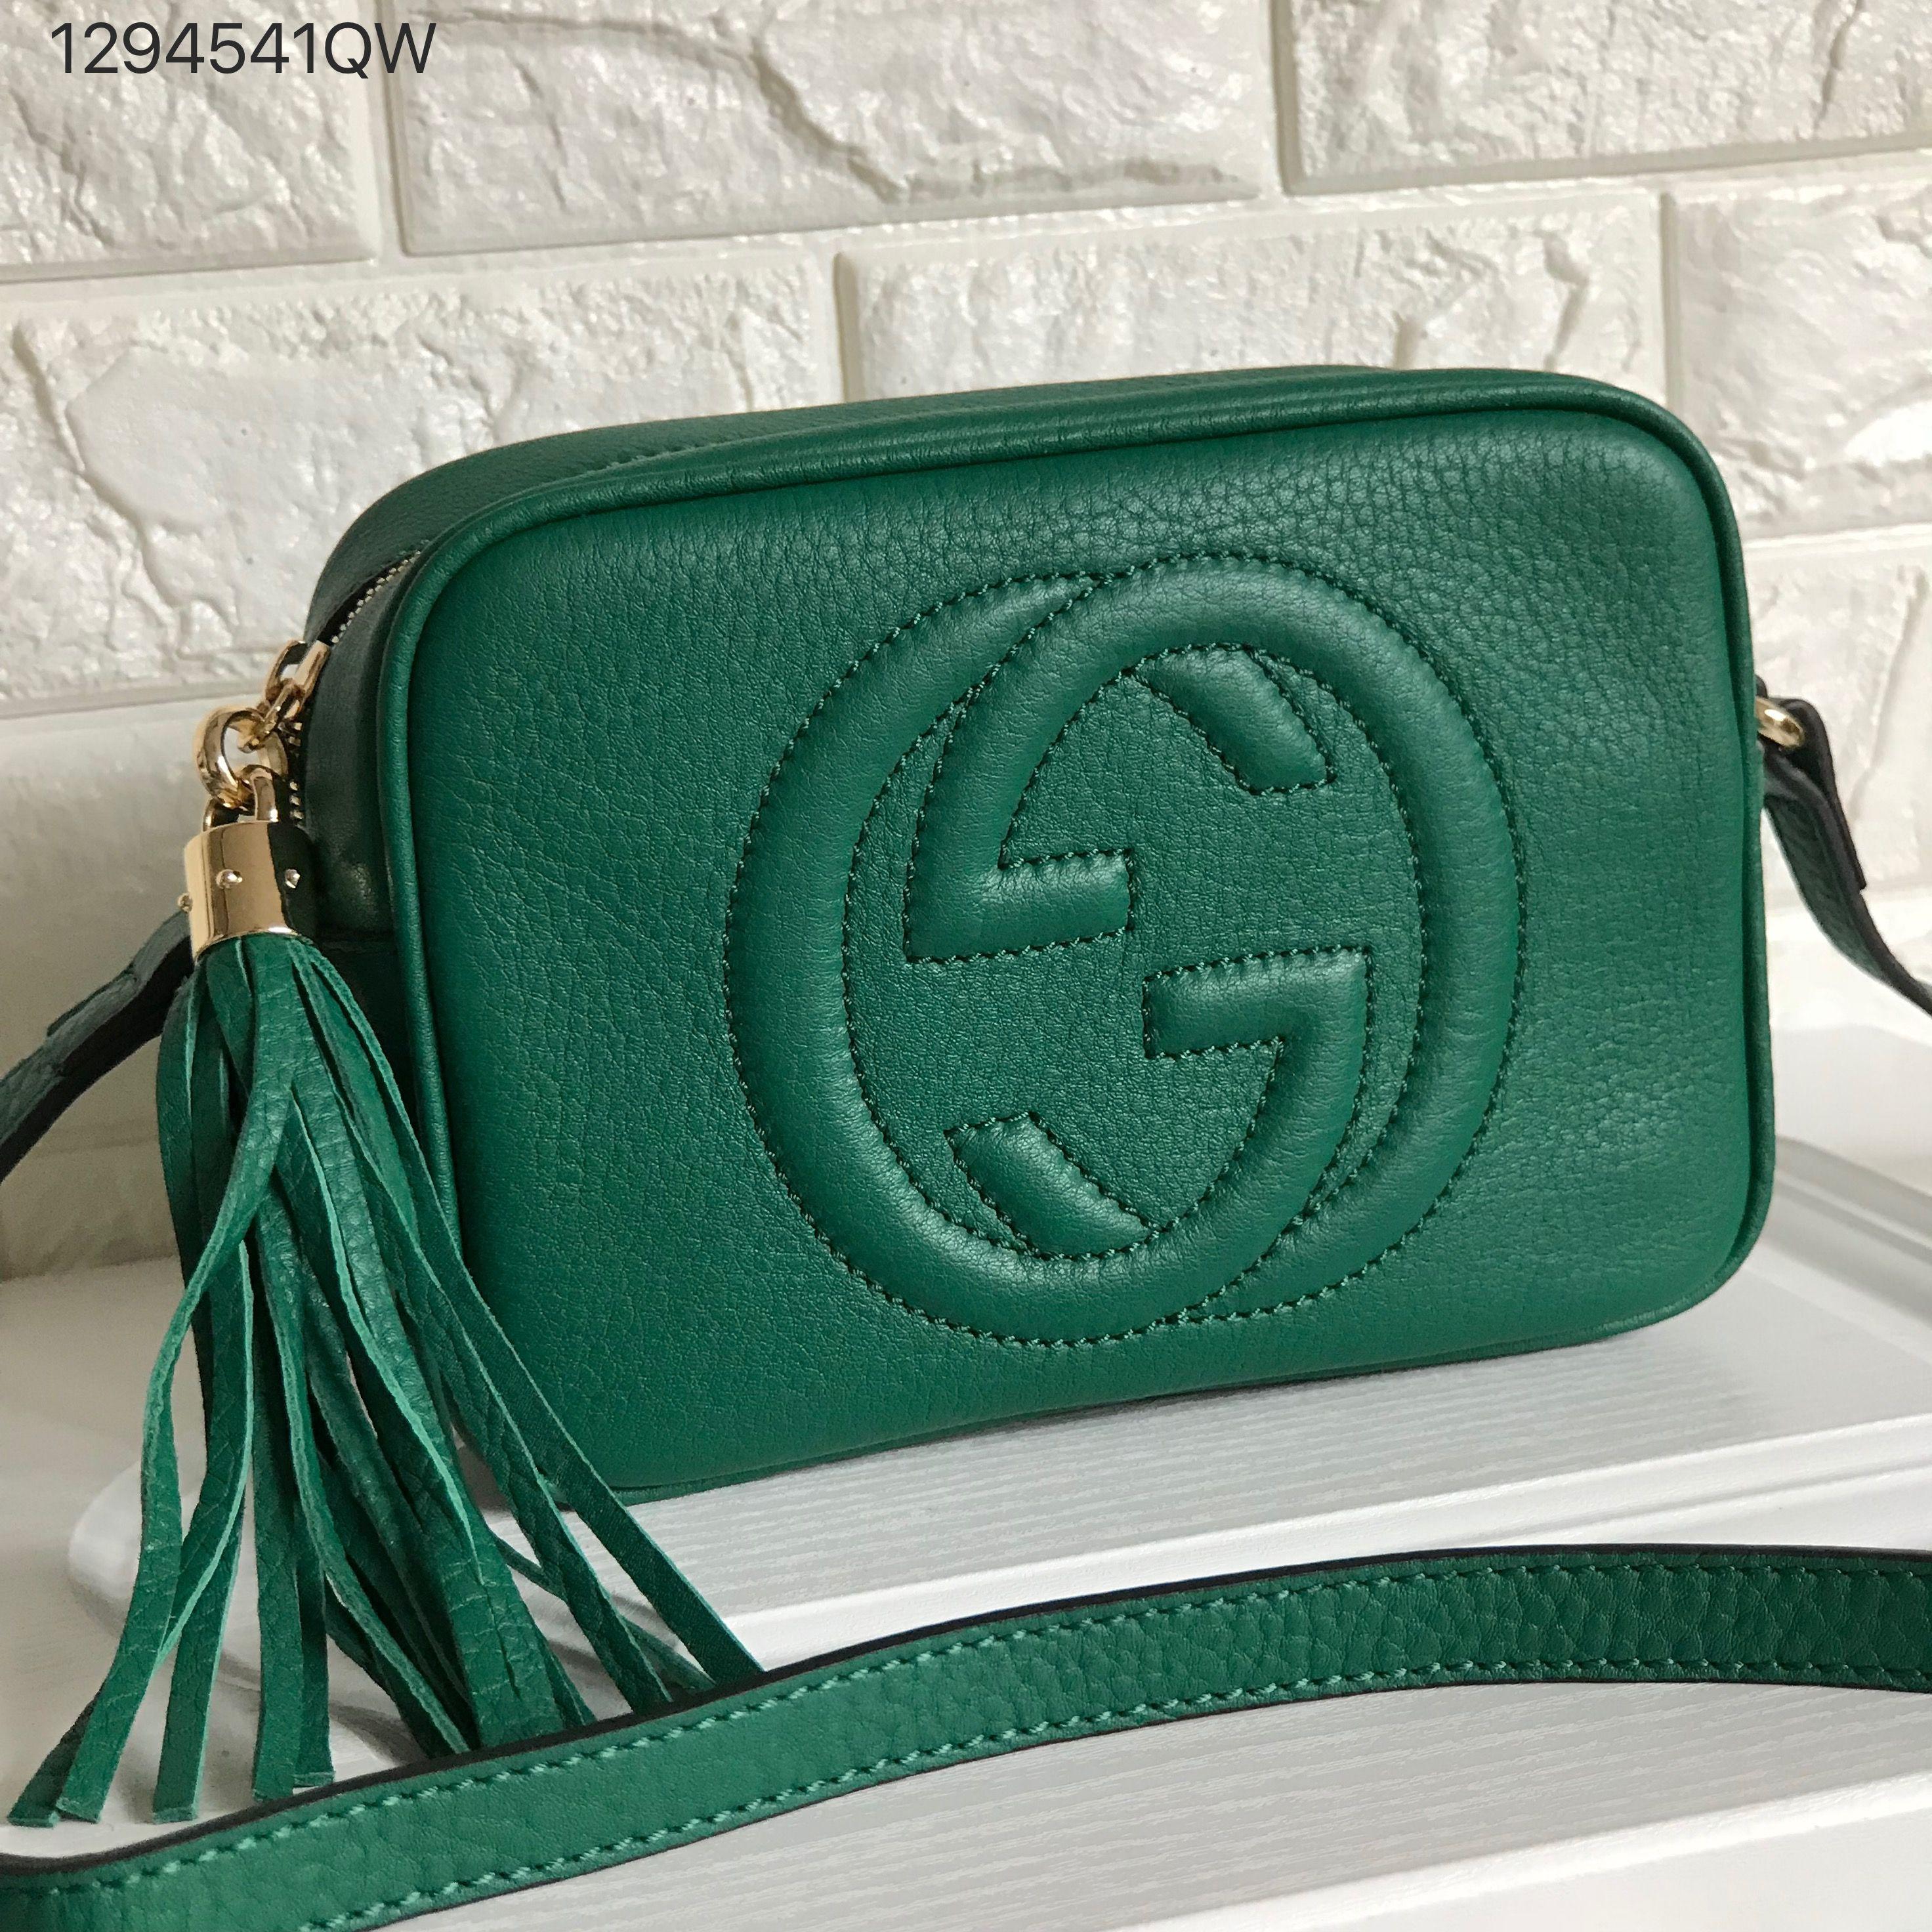 614c654d3aae Gucci soho disco cross body camera bag green | Gucci bags in 2019 ...